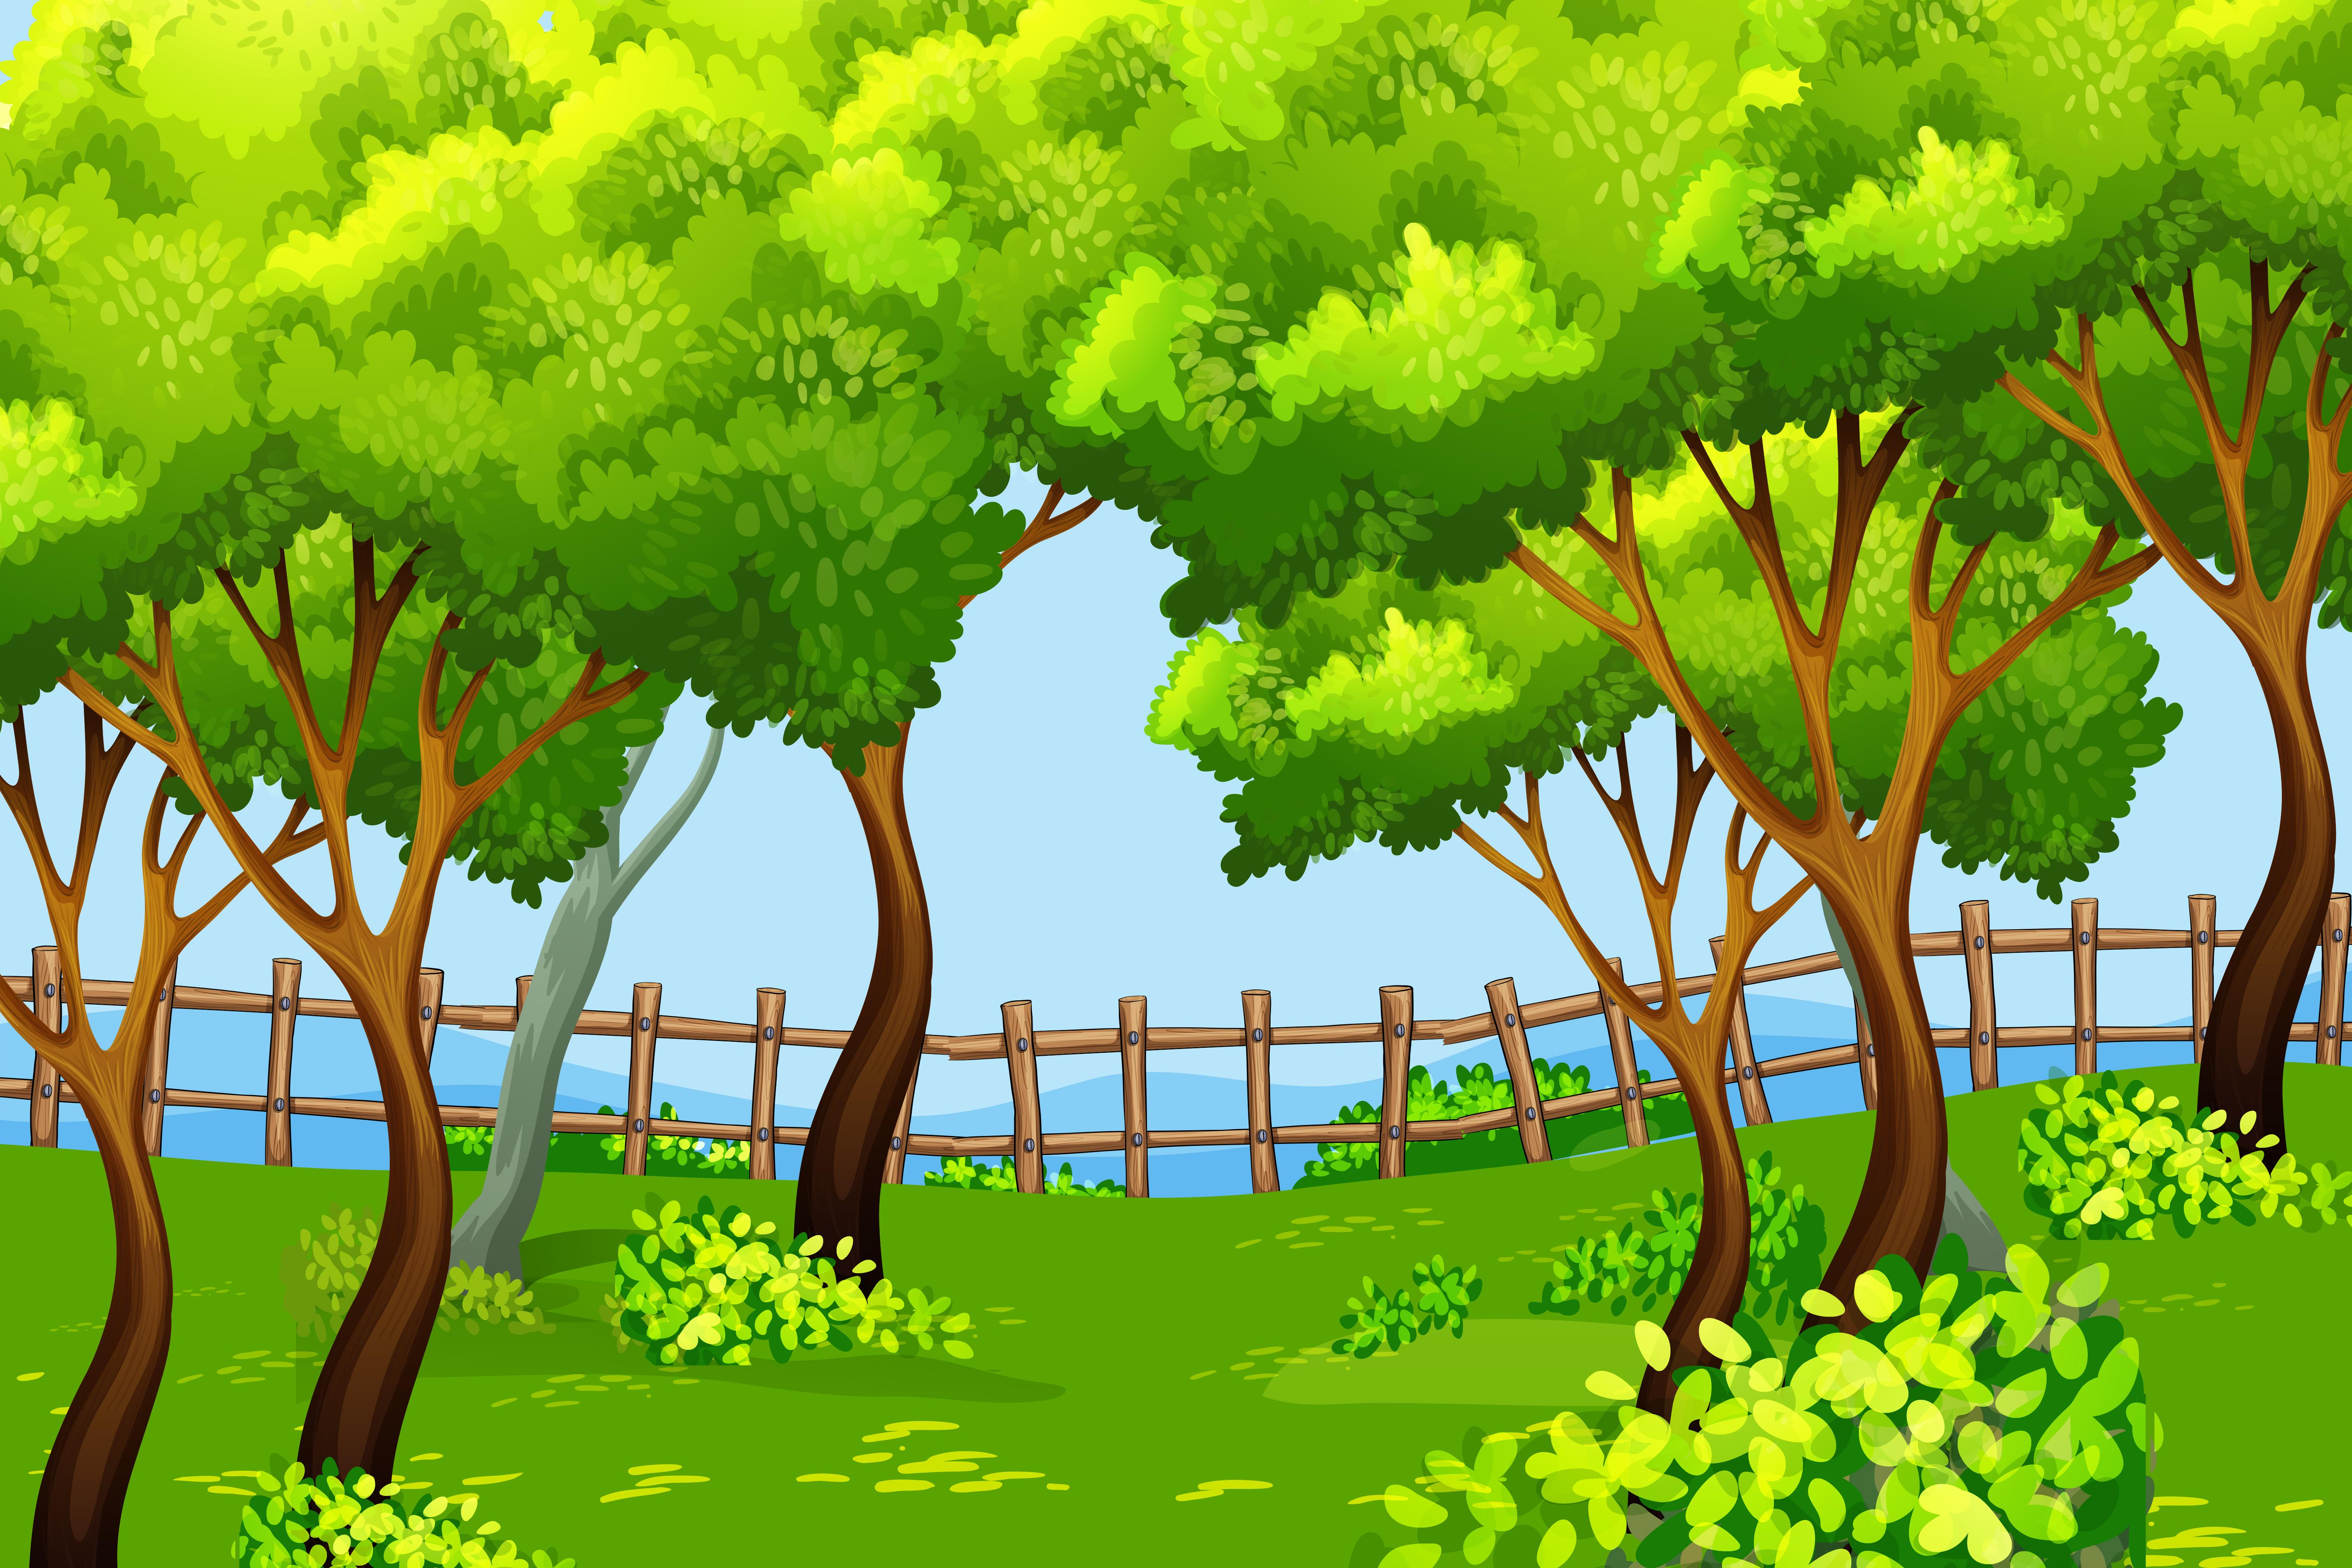 Park scene landscape background - Download Free Vectors ...